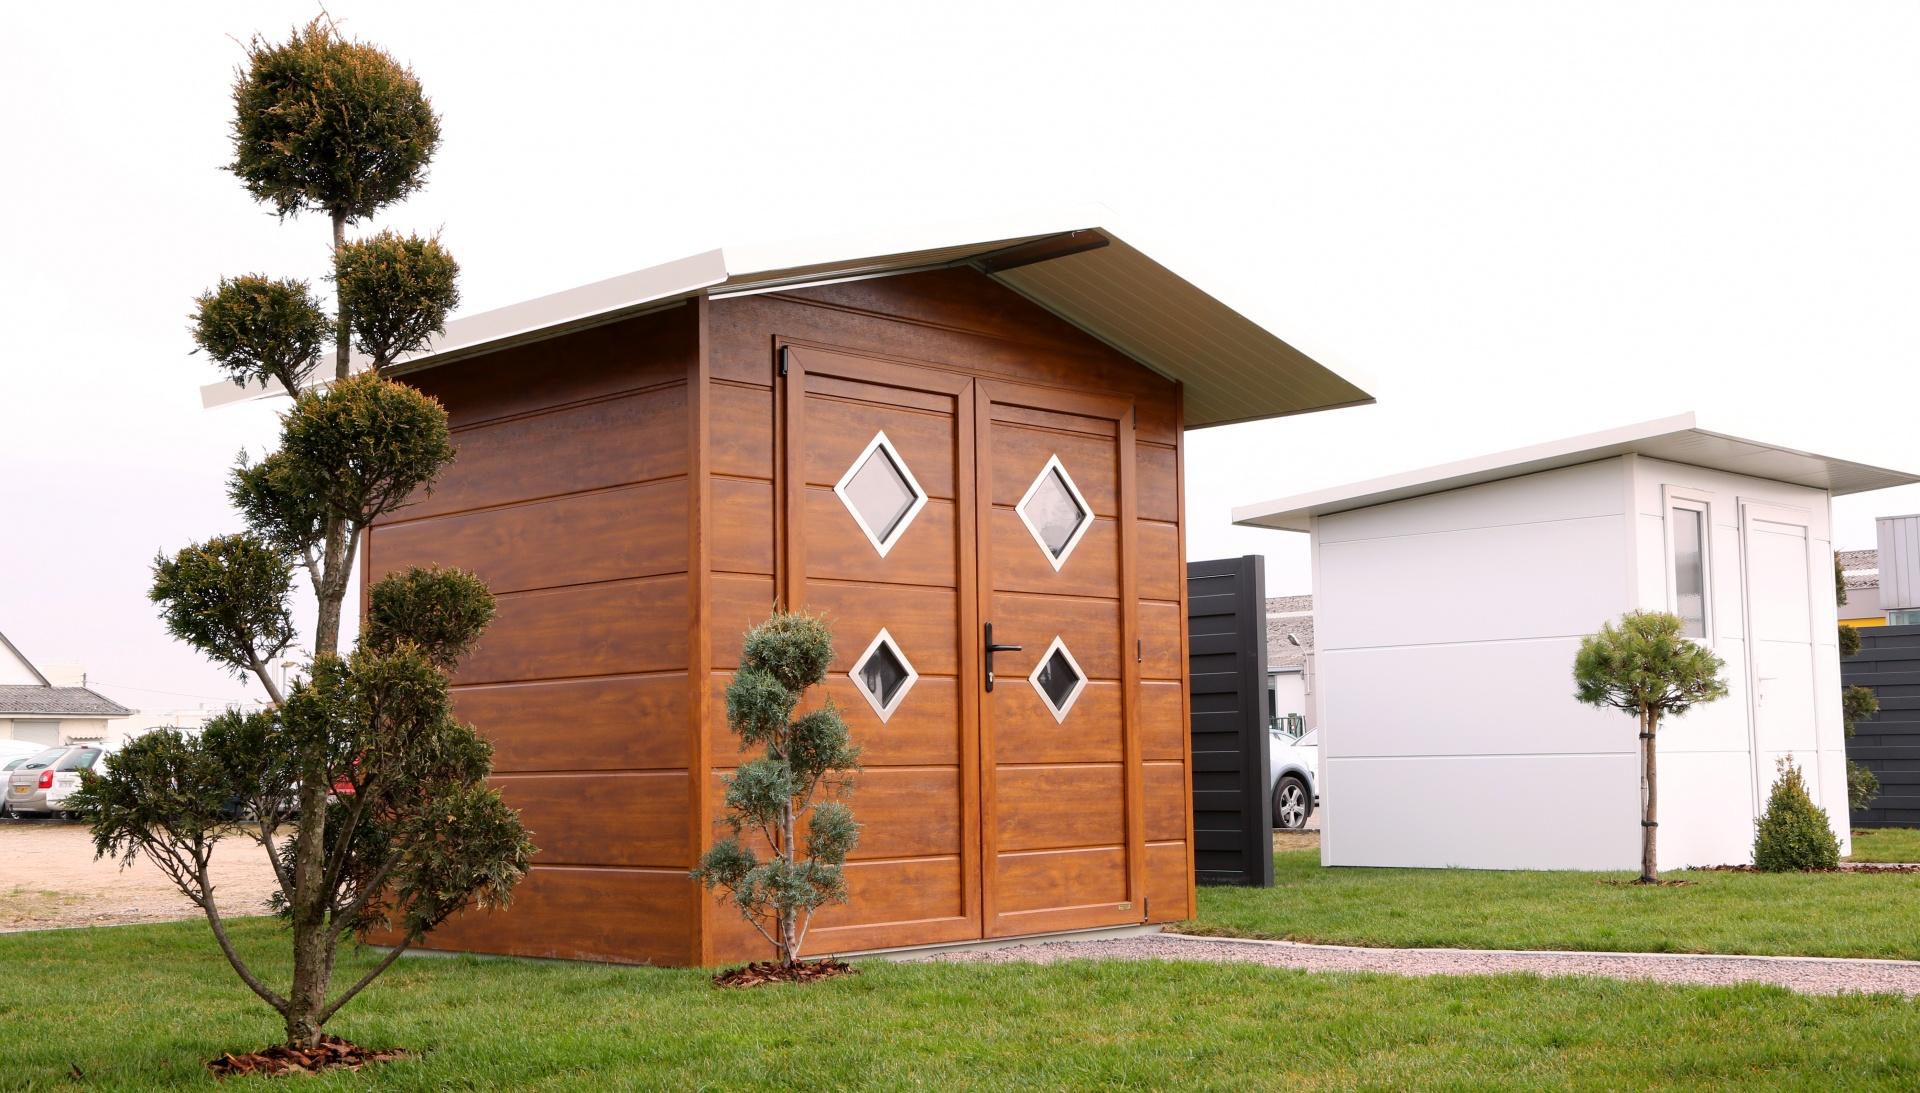 Galerie pavillons de jardin trendel fabriquants de for Trendel haguenau portes de garage